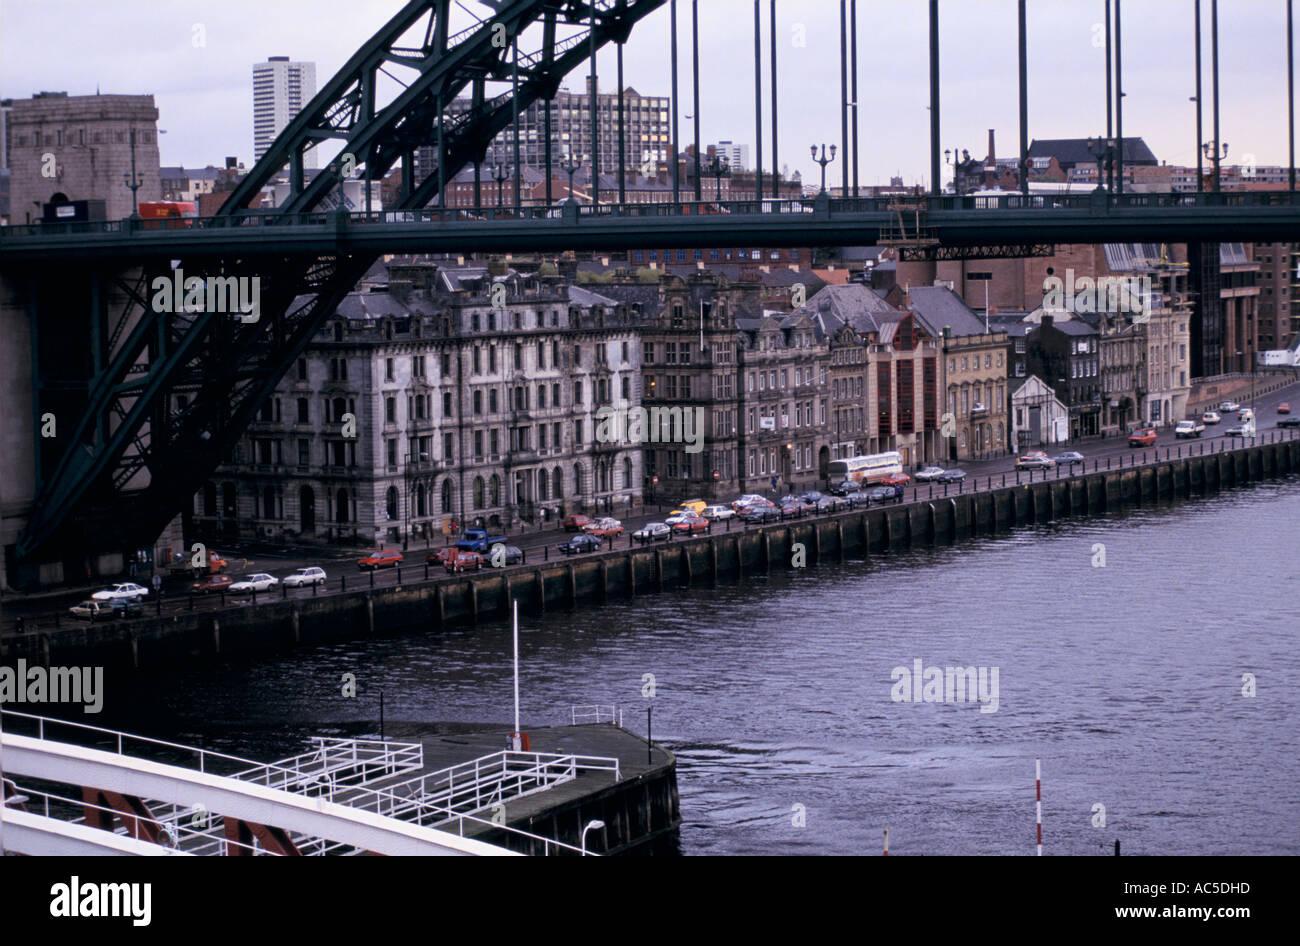 RIVER TYNE IN NEWCASTLE DECEMBER 1991 - Stock Image